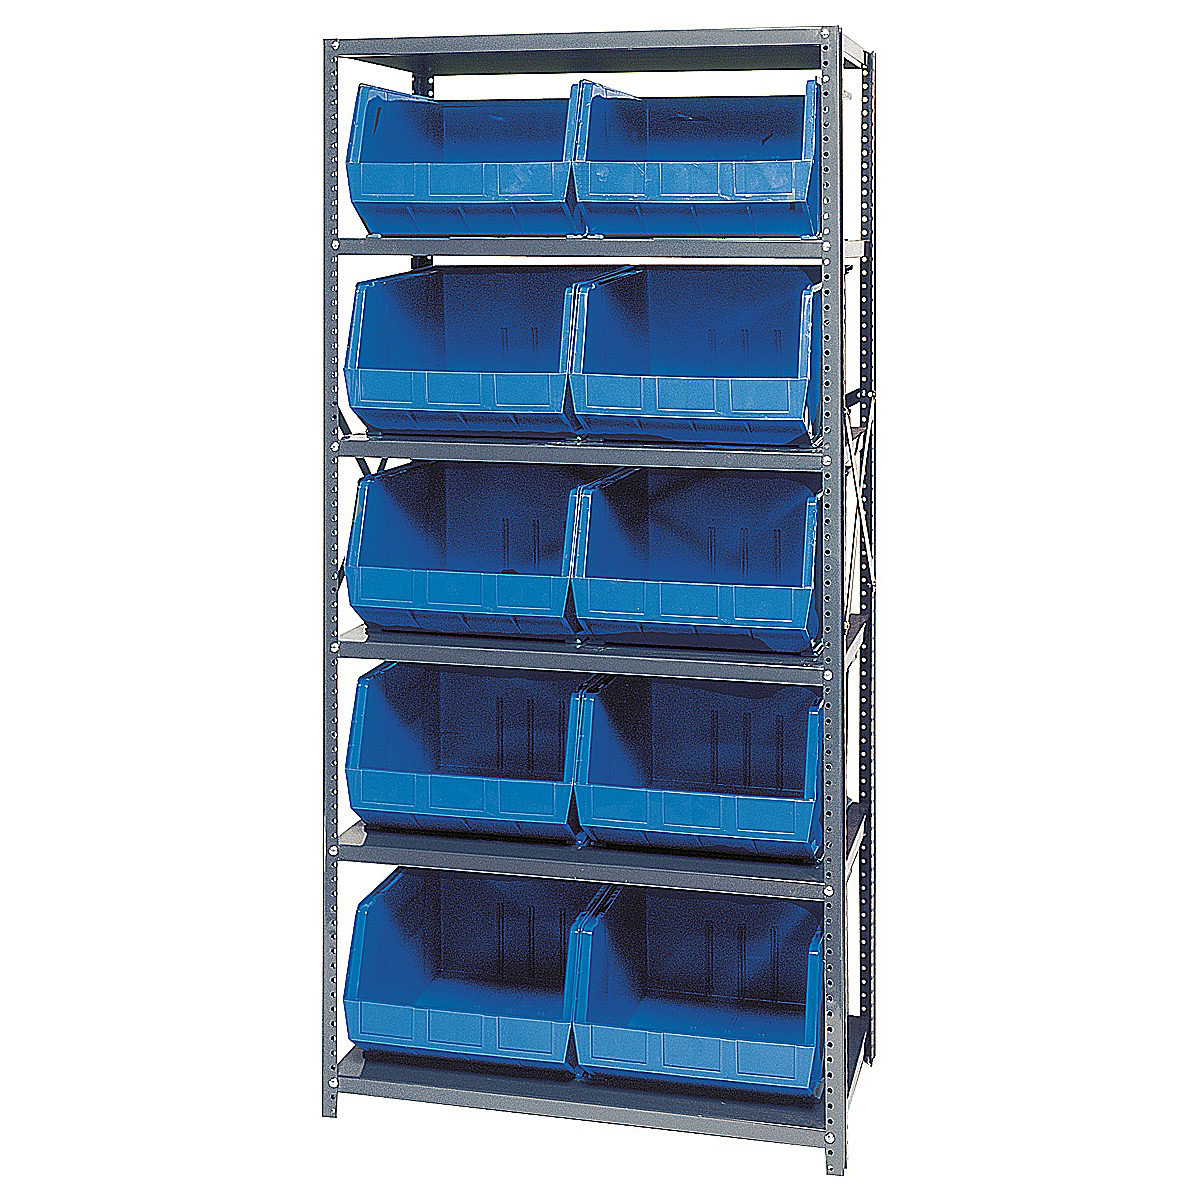 Open Hopper Storage Unit - 10 Bins in Plastic Storage Bins